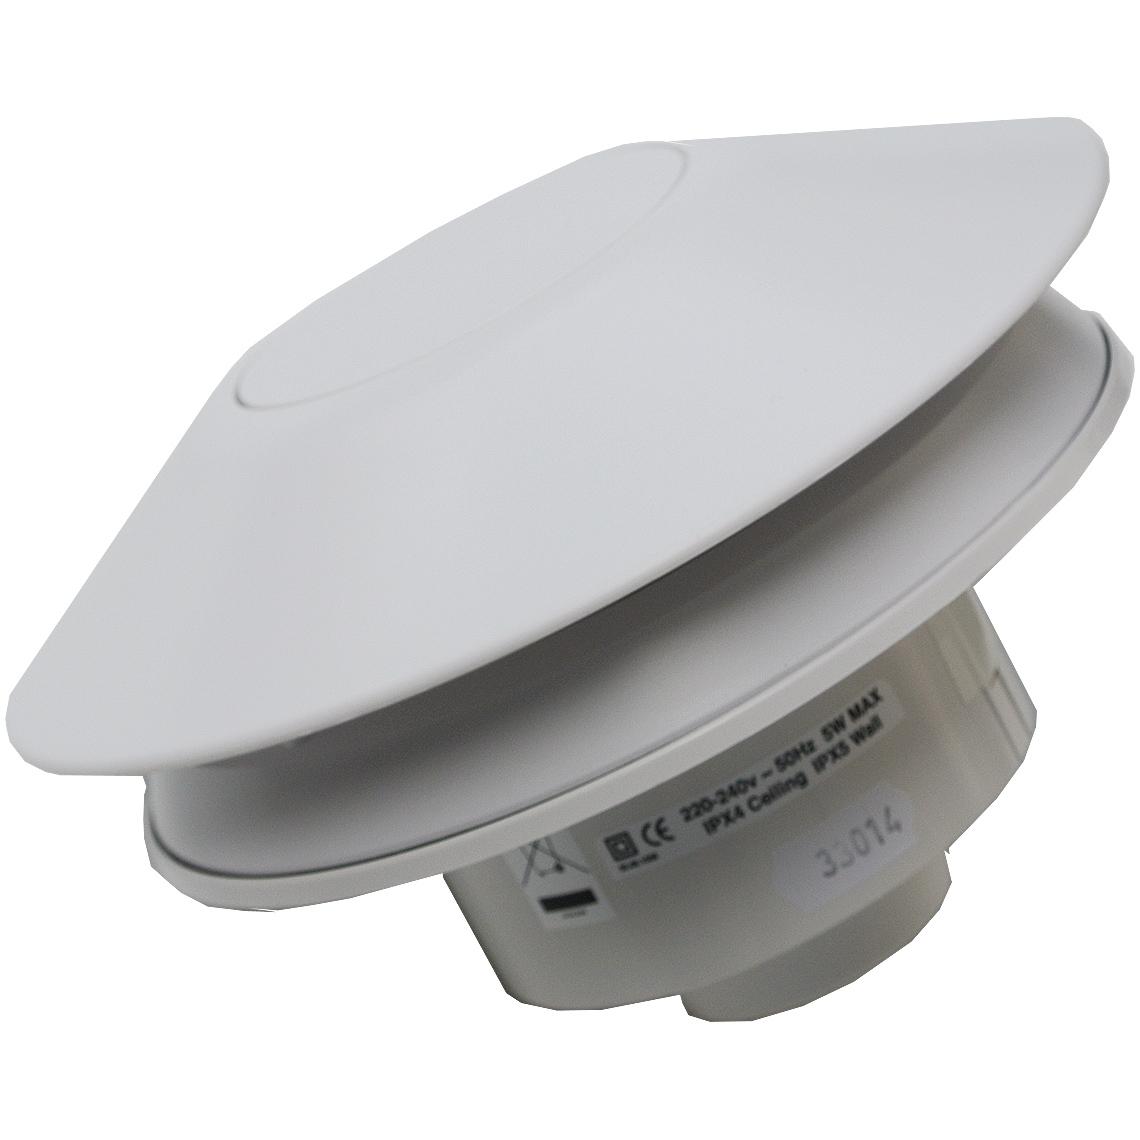 Estrattore aria per bagno cieco zehnder zcv2 sintesibagnoblog - Aspiratore bagno senza uscita esterna ...